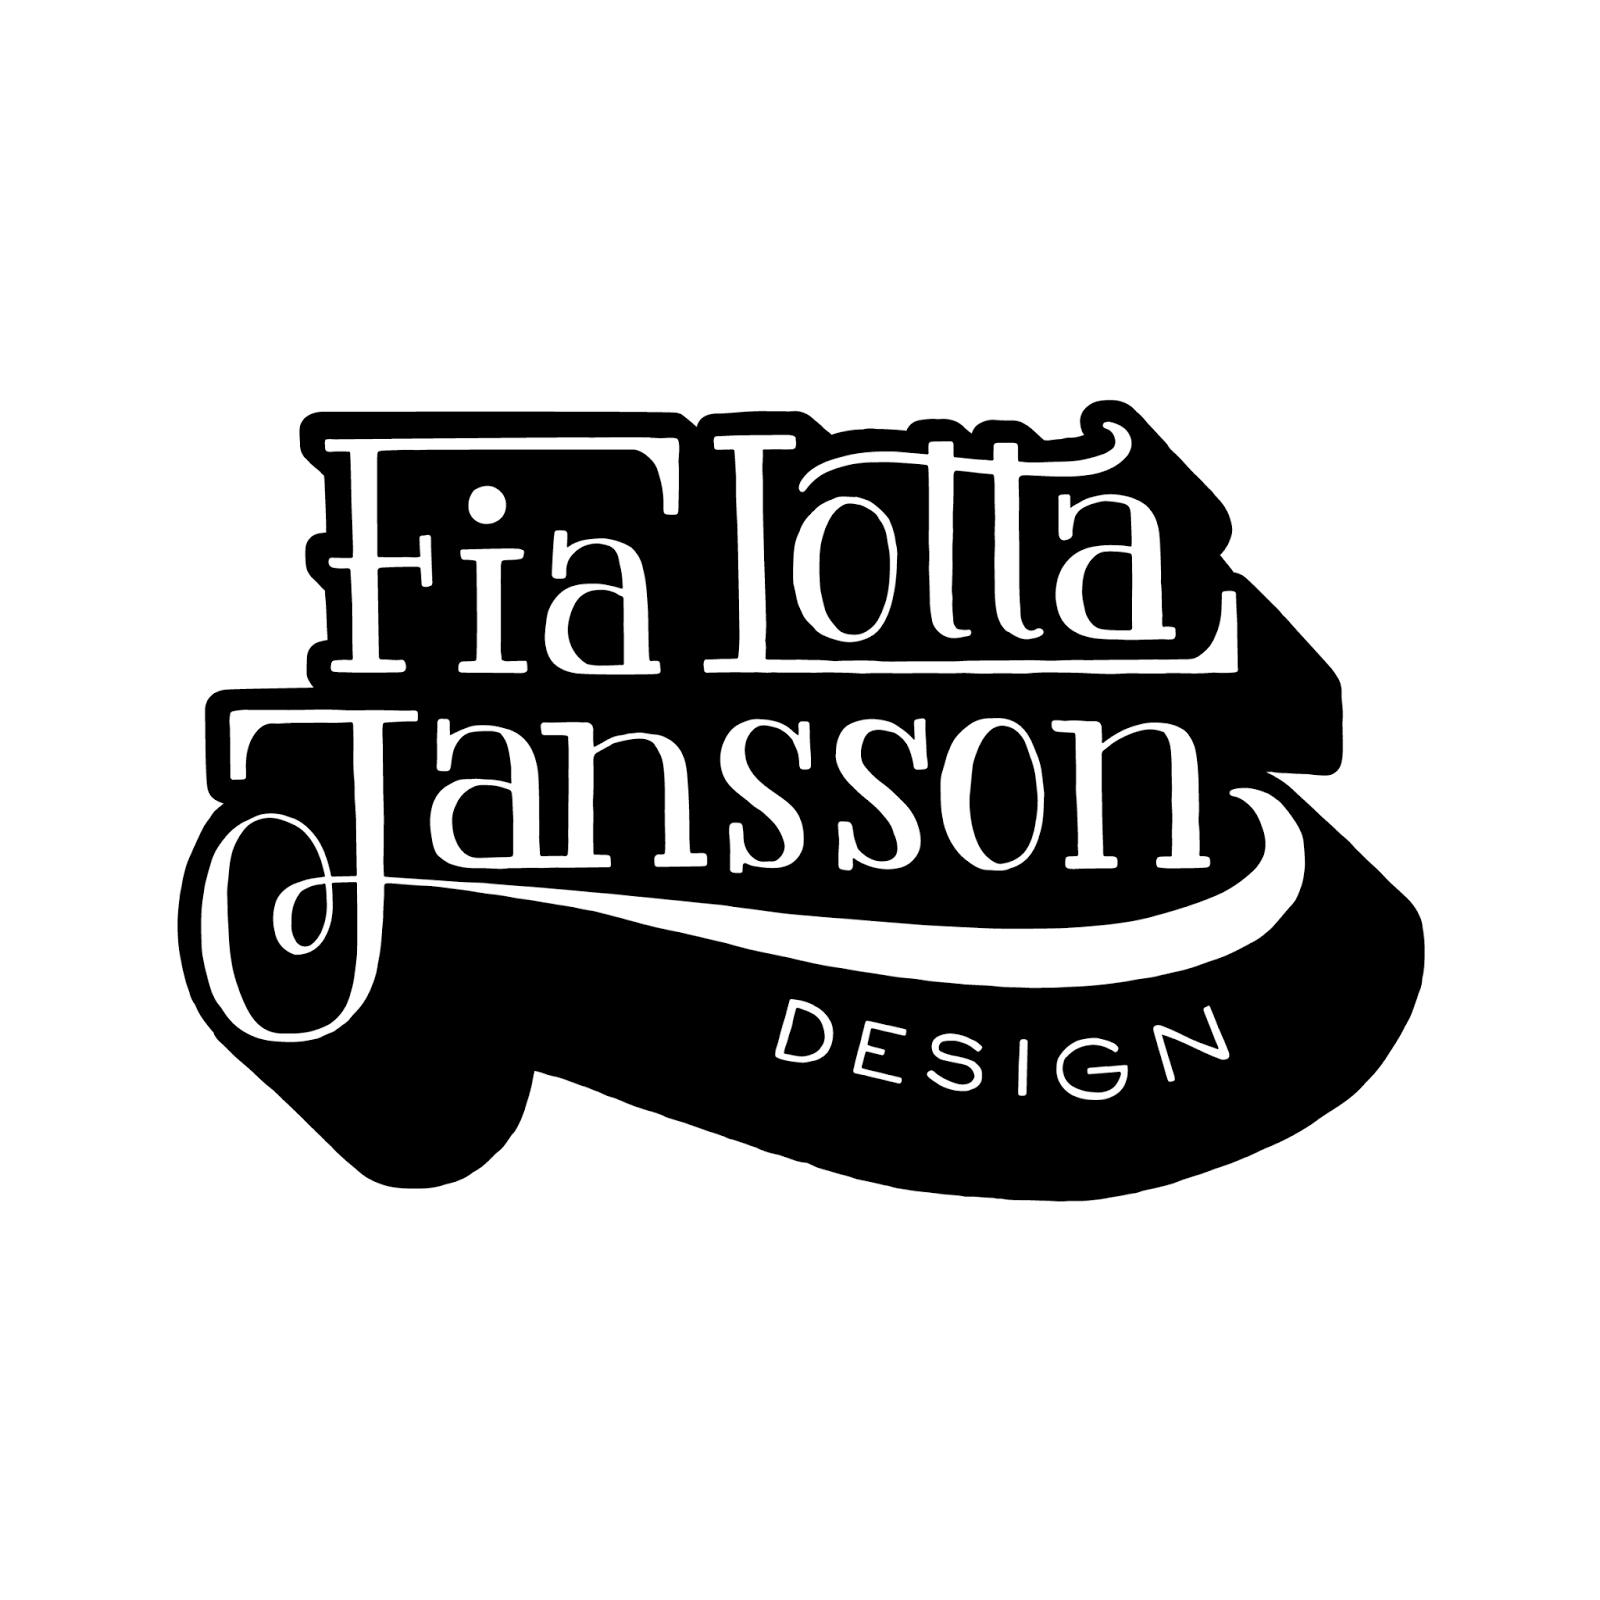 http://fialottajanssondesign.tumblr.com/